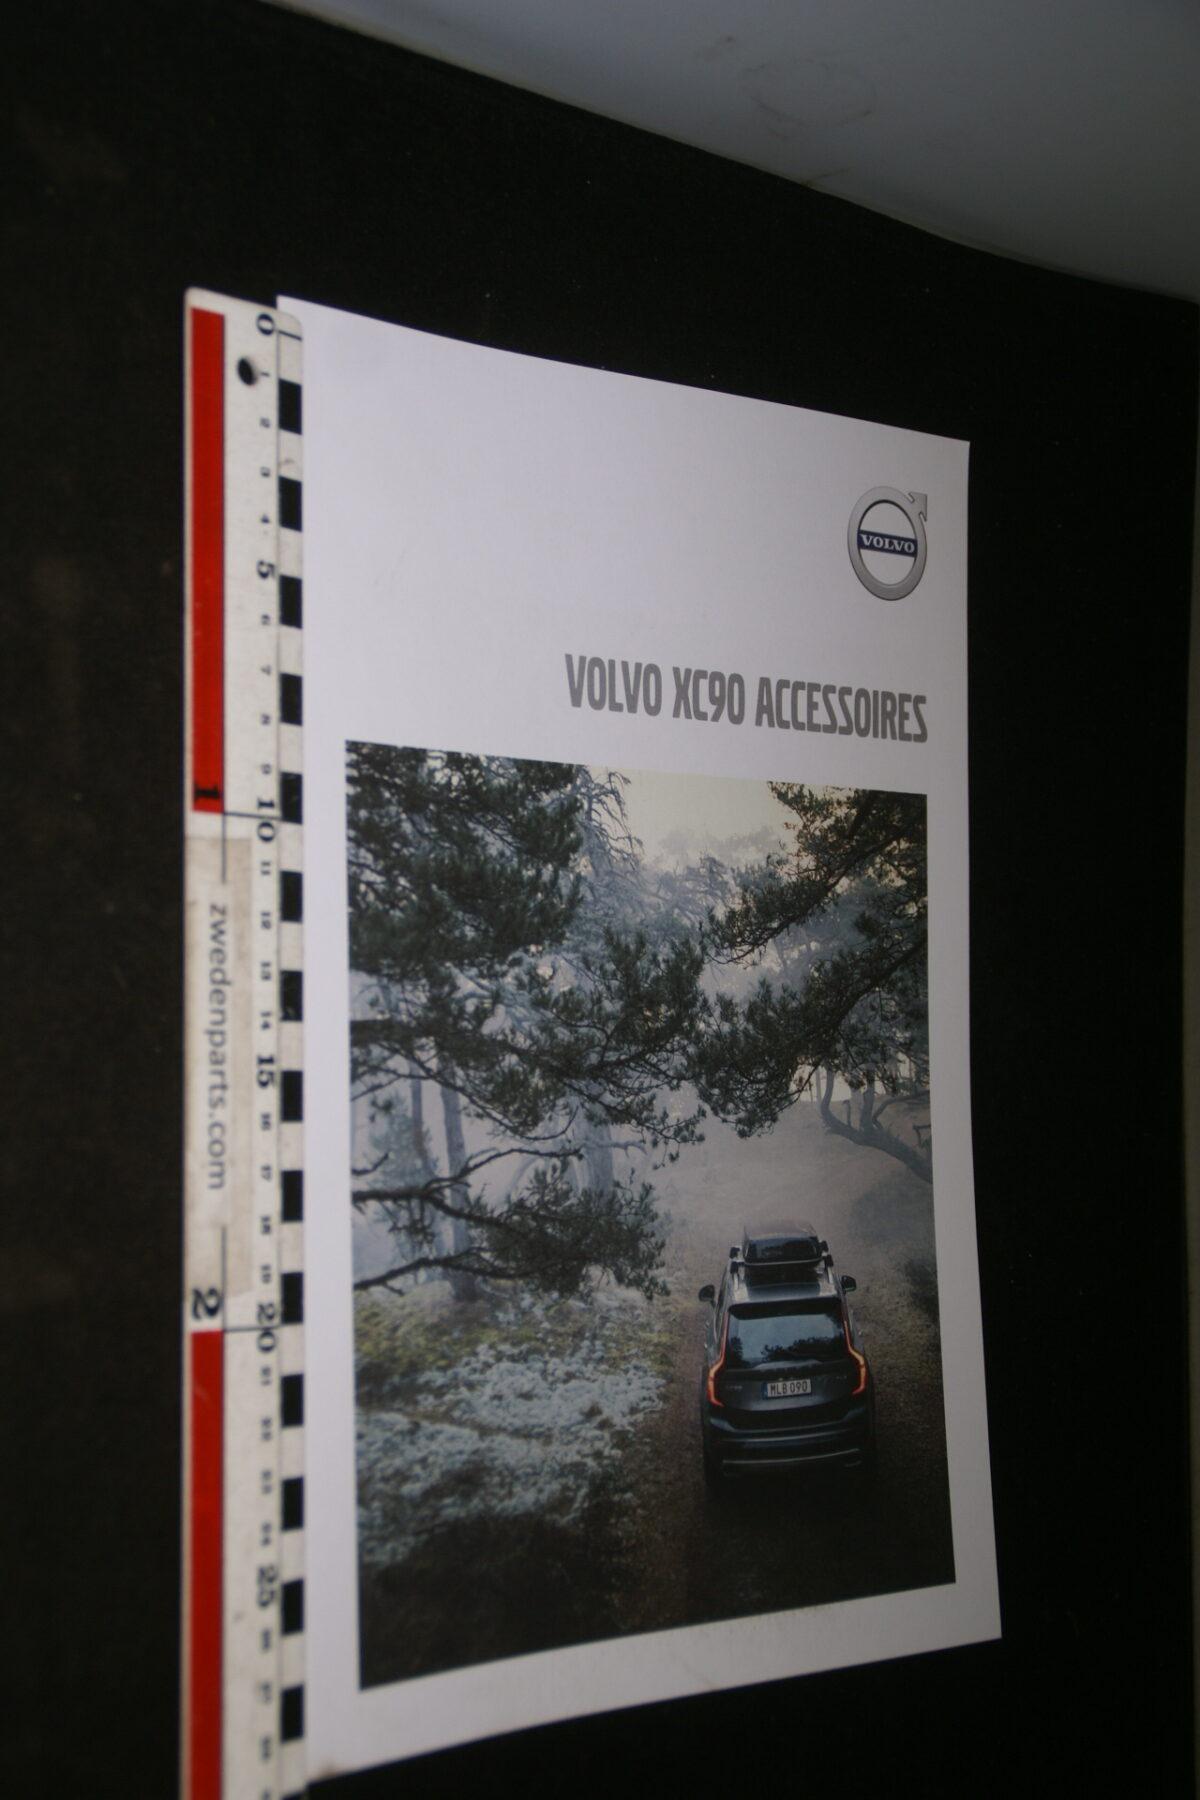 DSC04454 2019 brochure Volvo XC90 nr. MY 18 6-2018-V1-56b34a9c